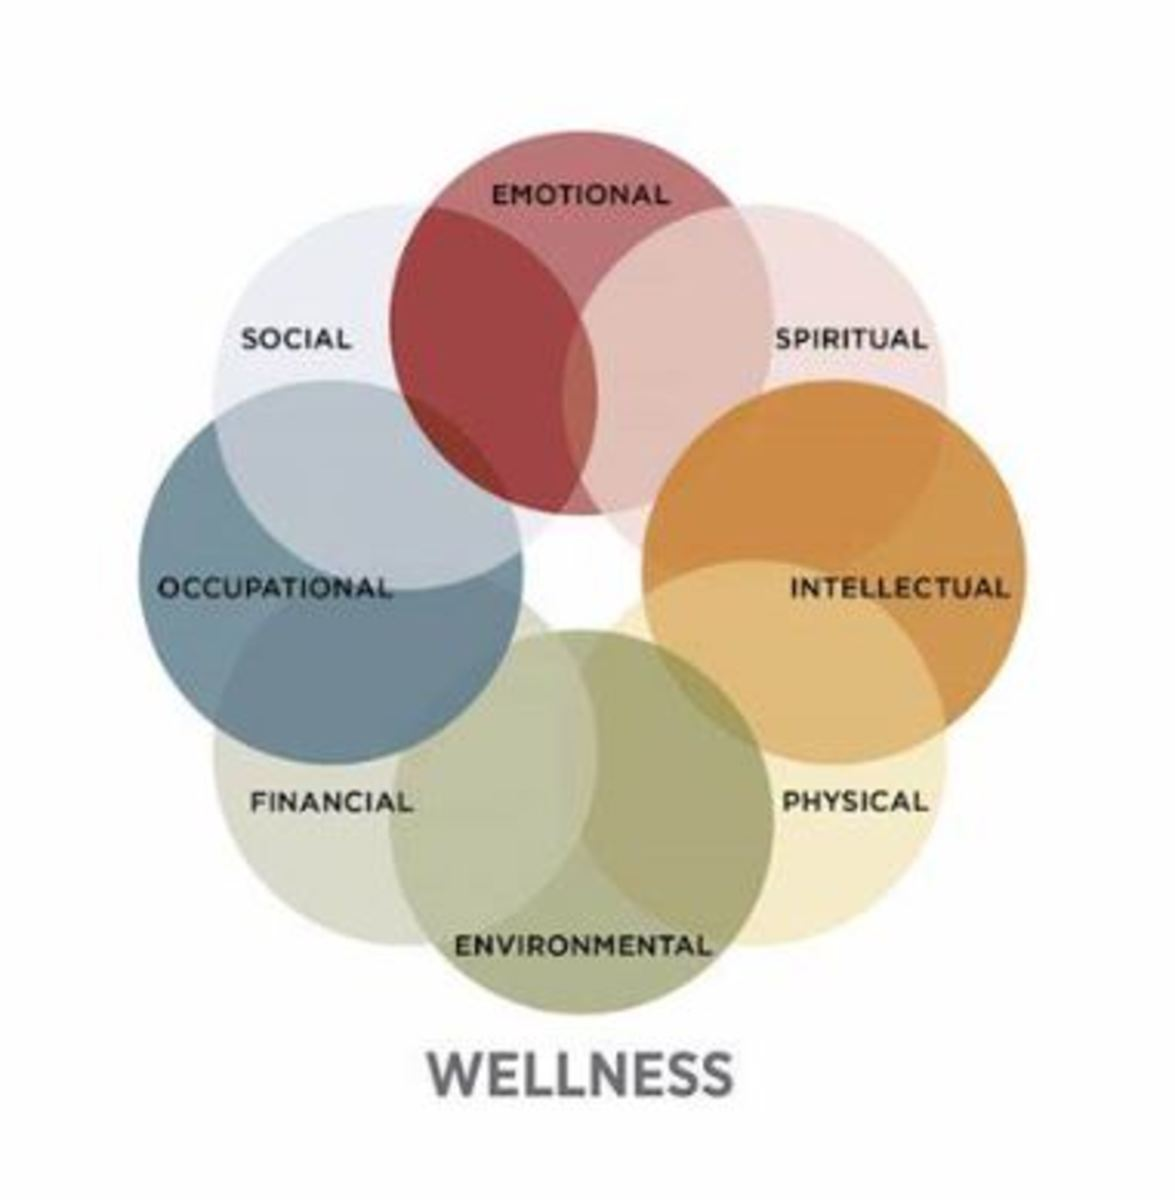 Your Wellness Wheel